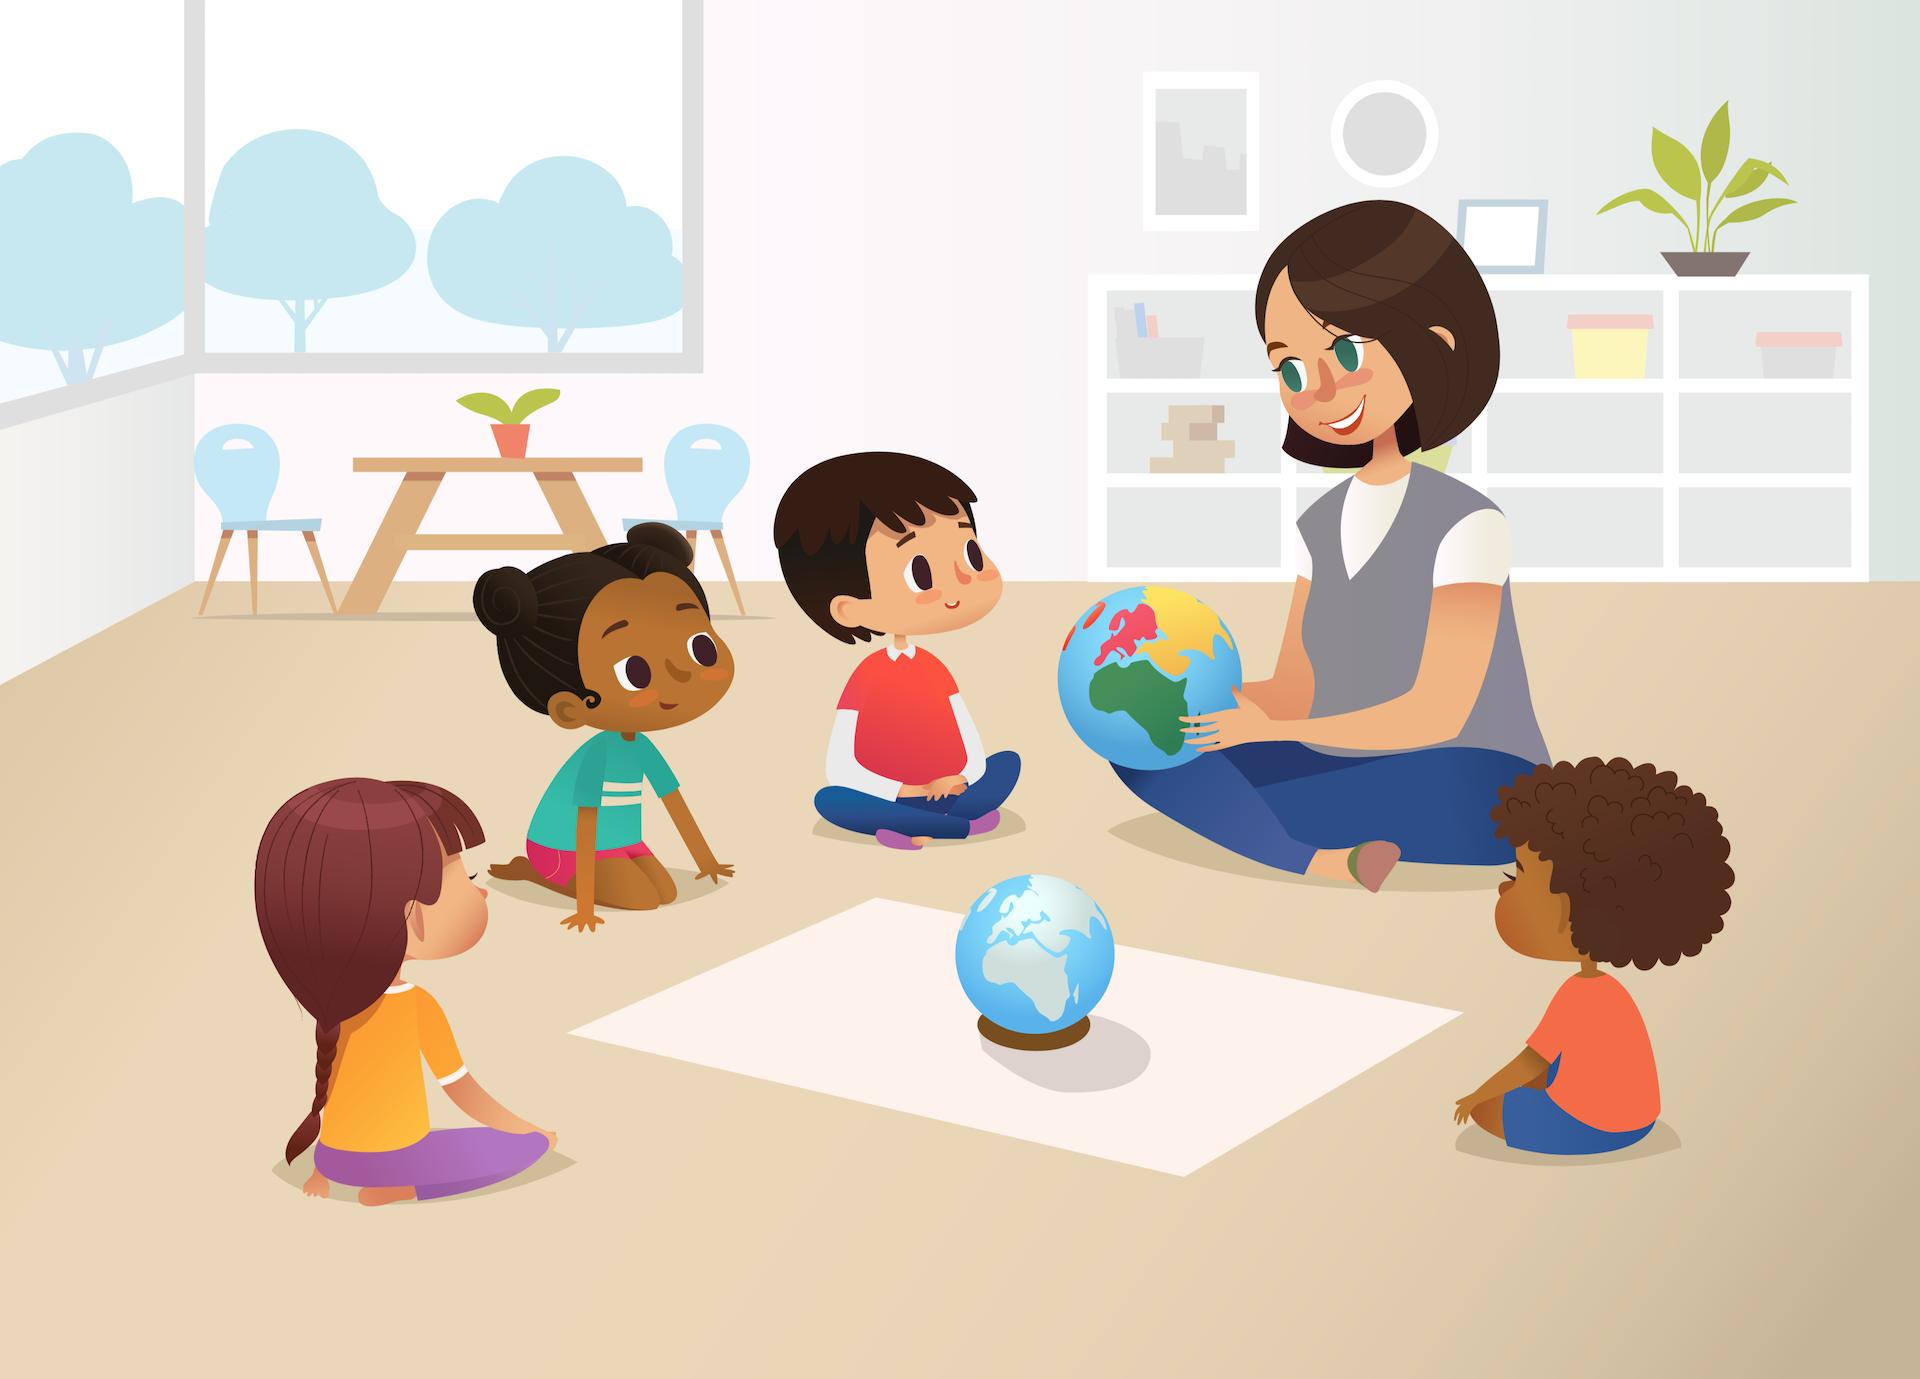 Preschool Philosophies: The difference between Montessori and Reggio Emilia